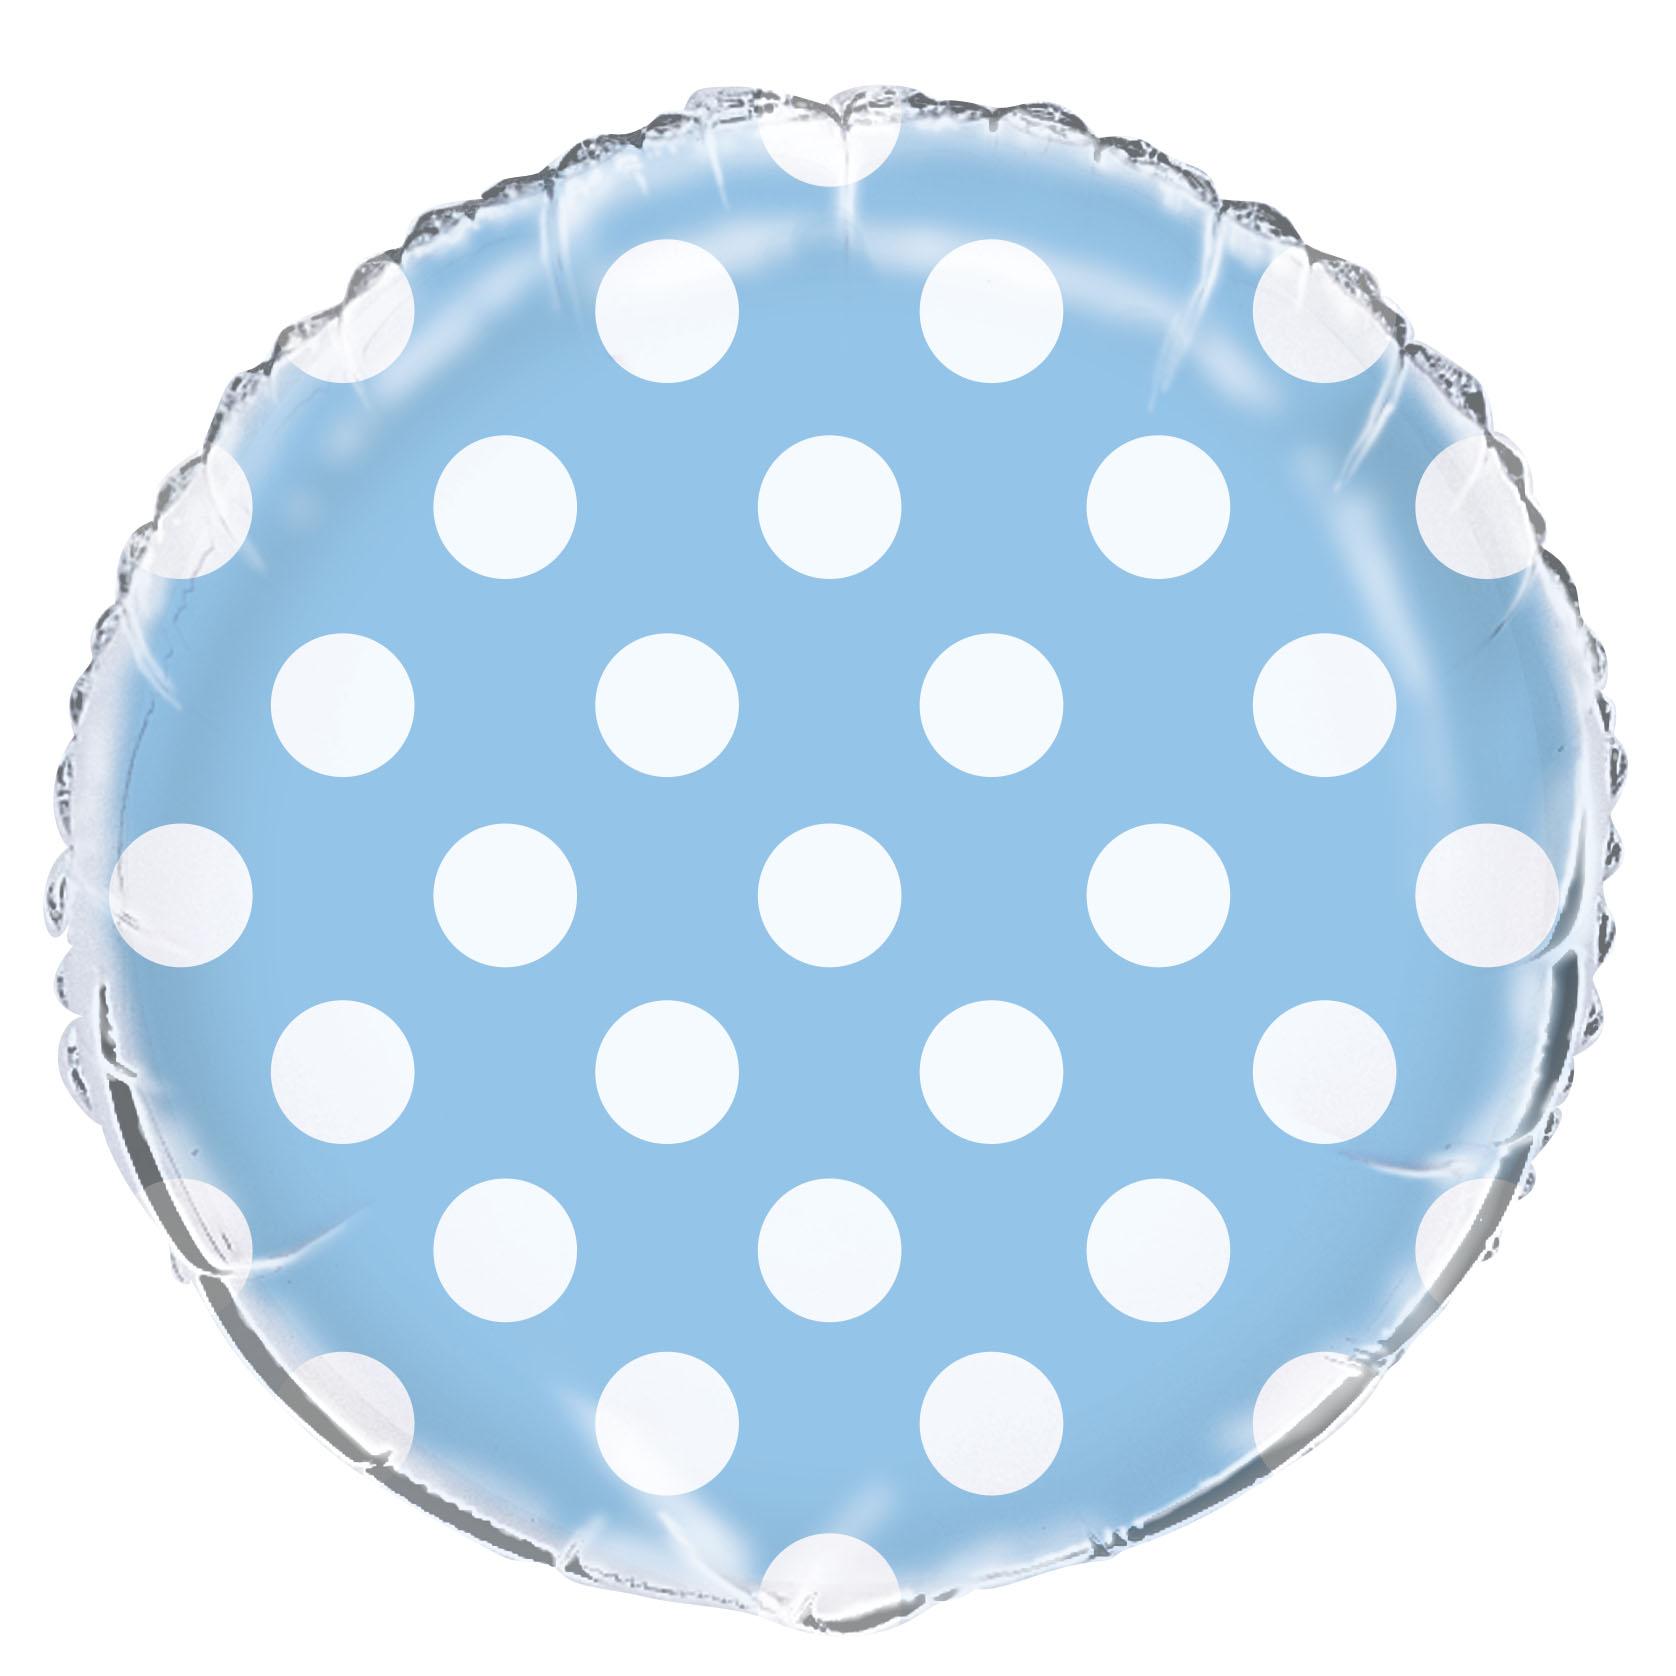 Ballon mylar bleu clair à pois blanc